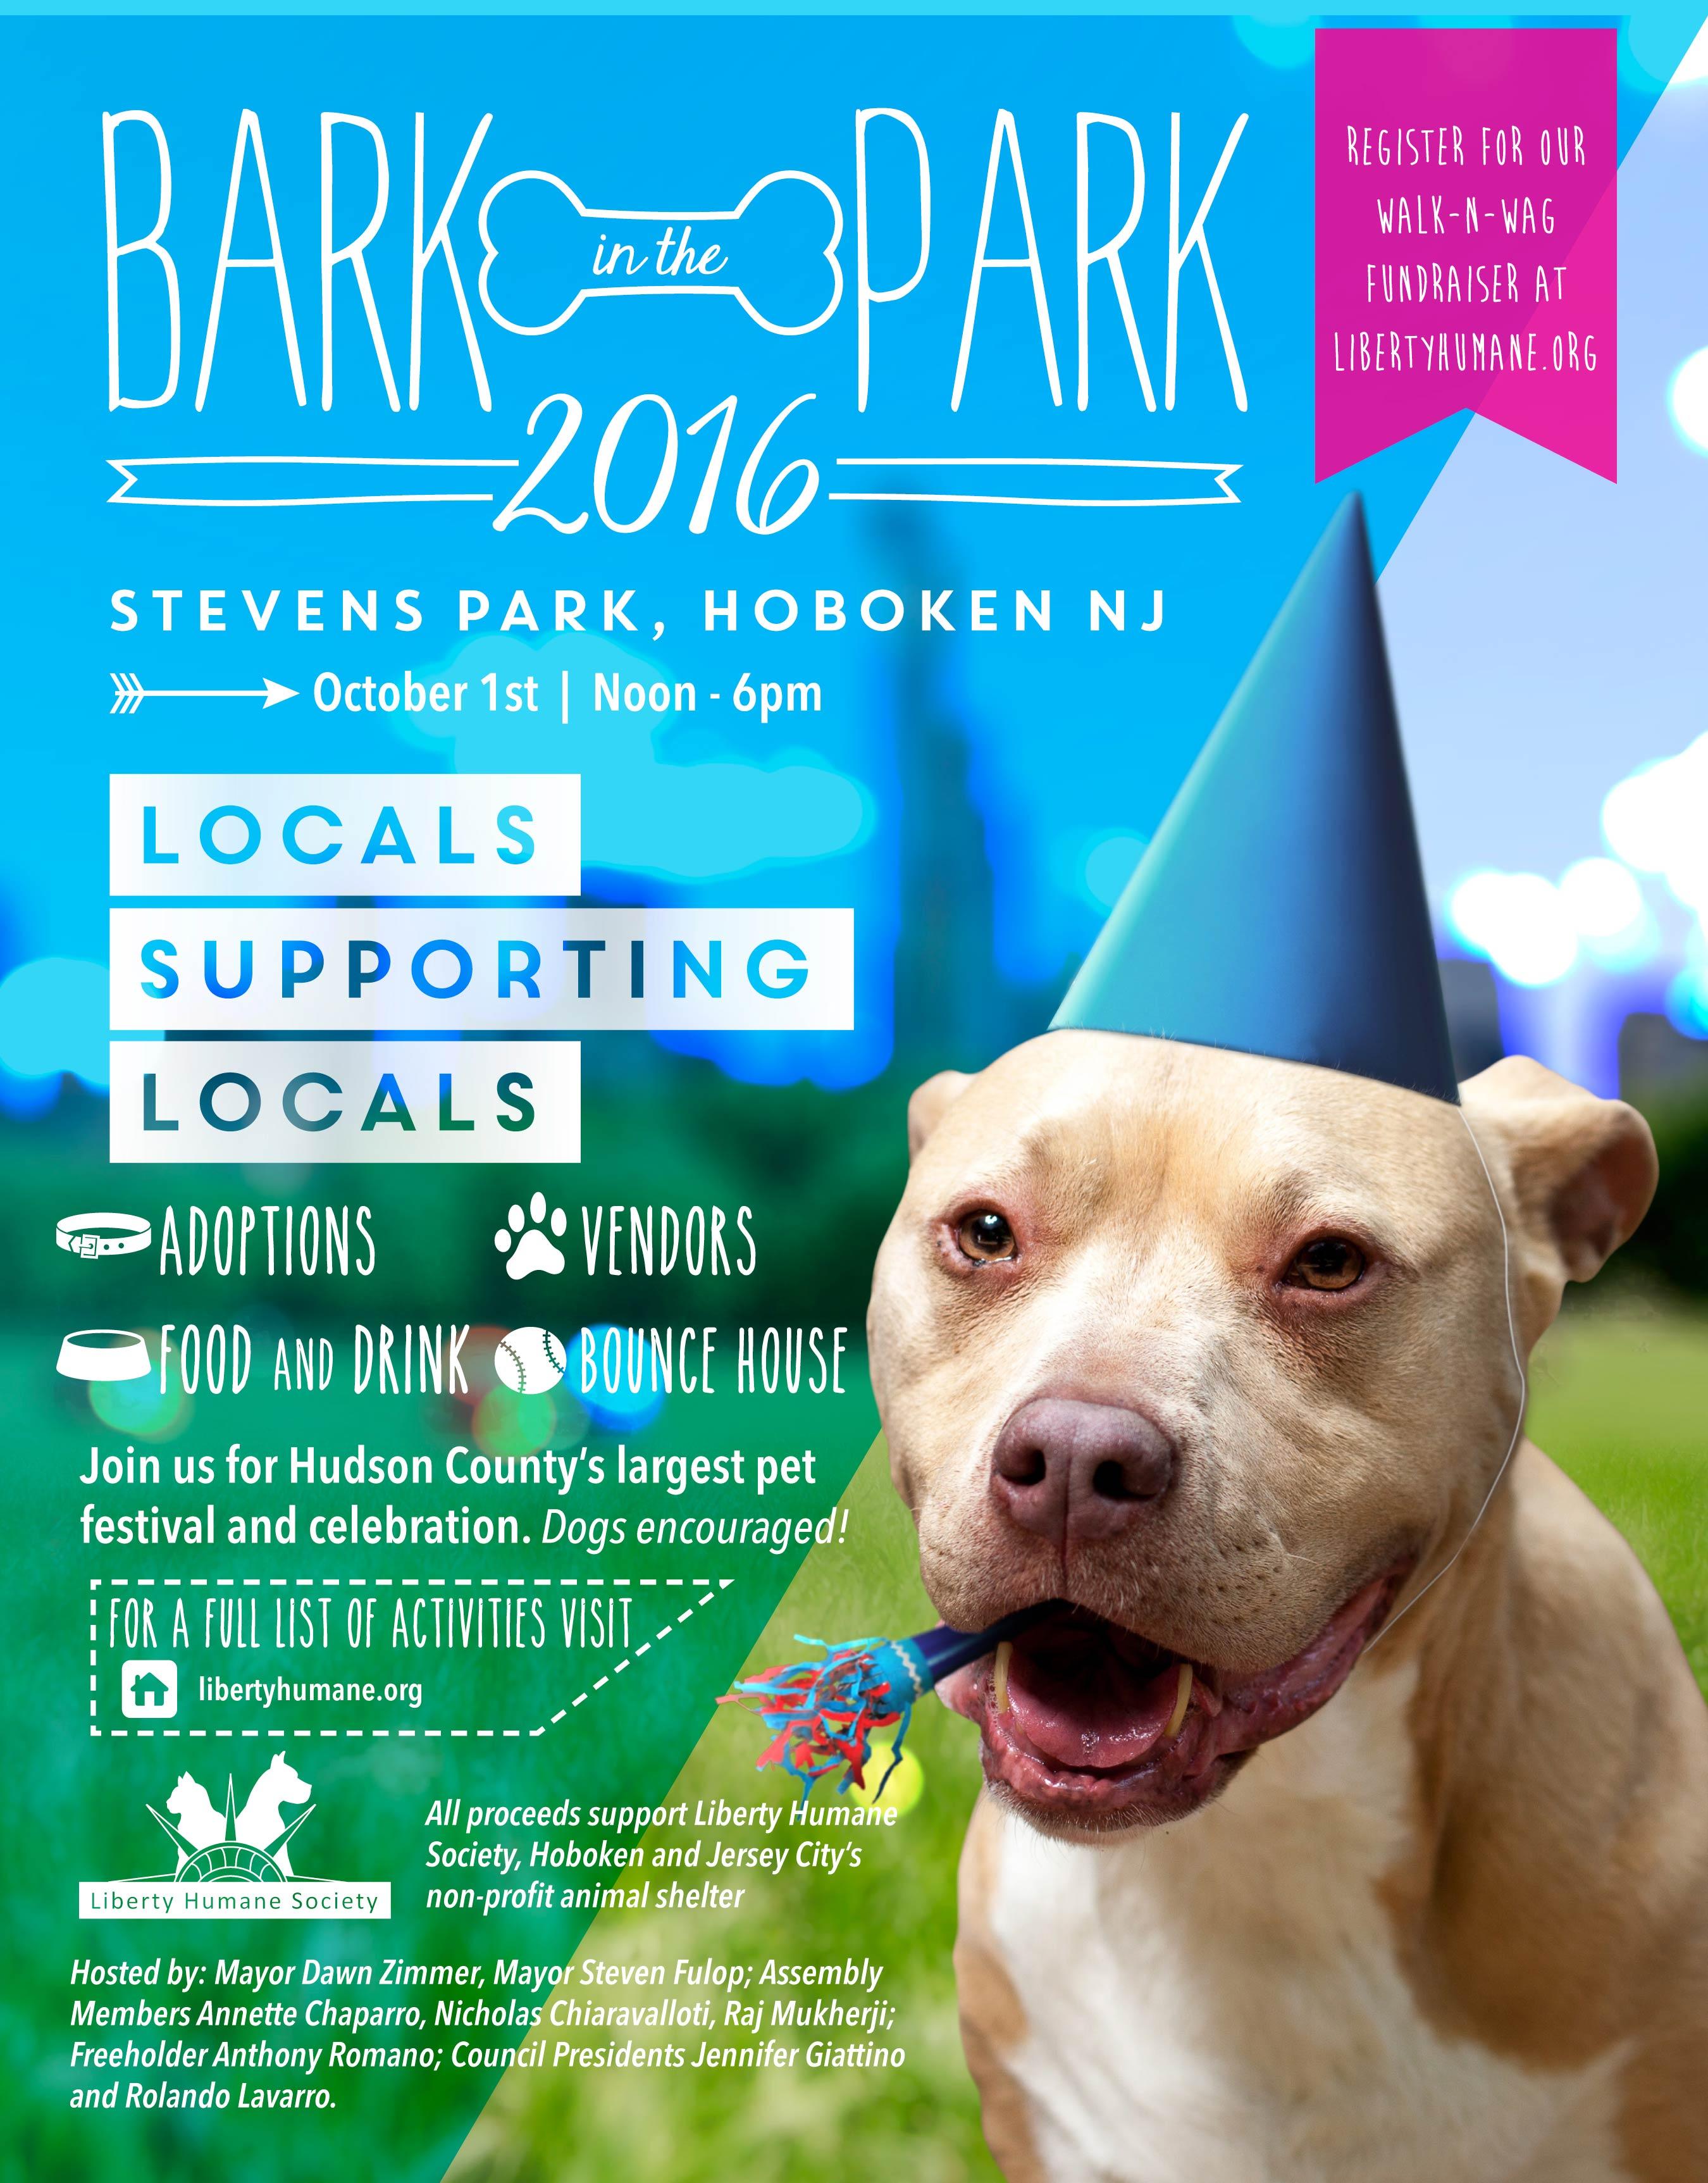 Bark in the Park 2016 - Liberty Humane Society